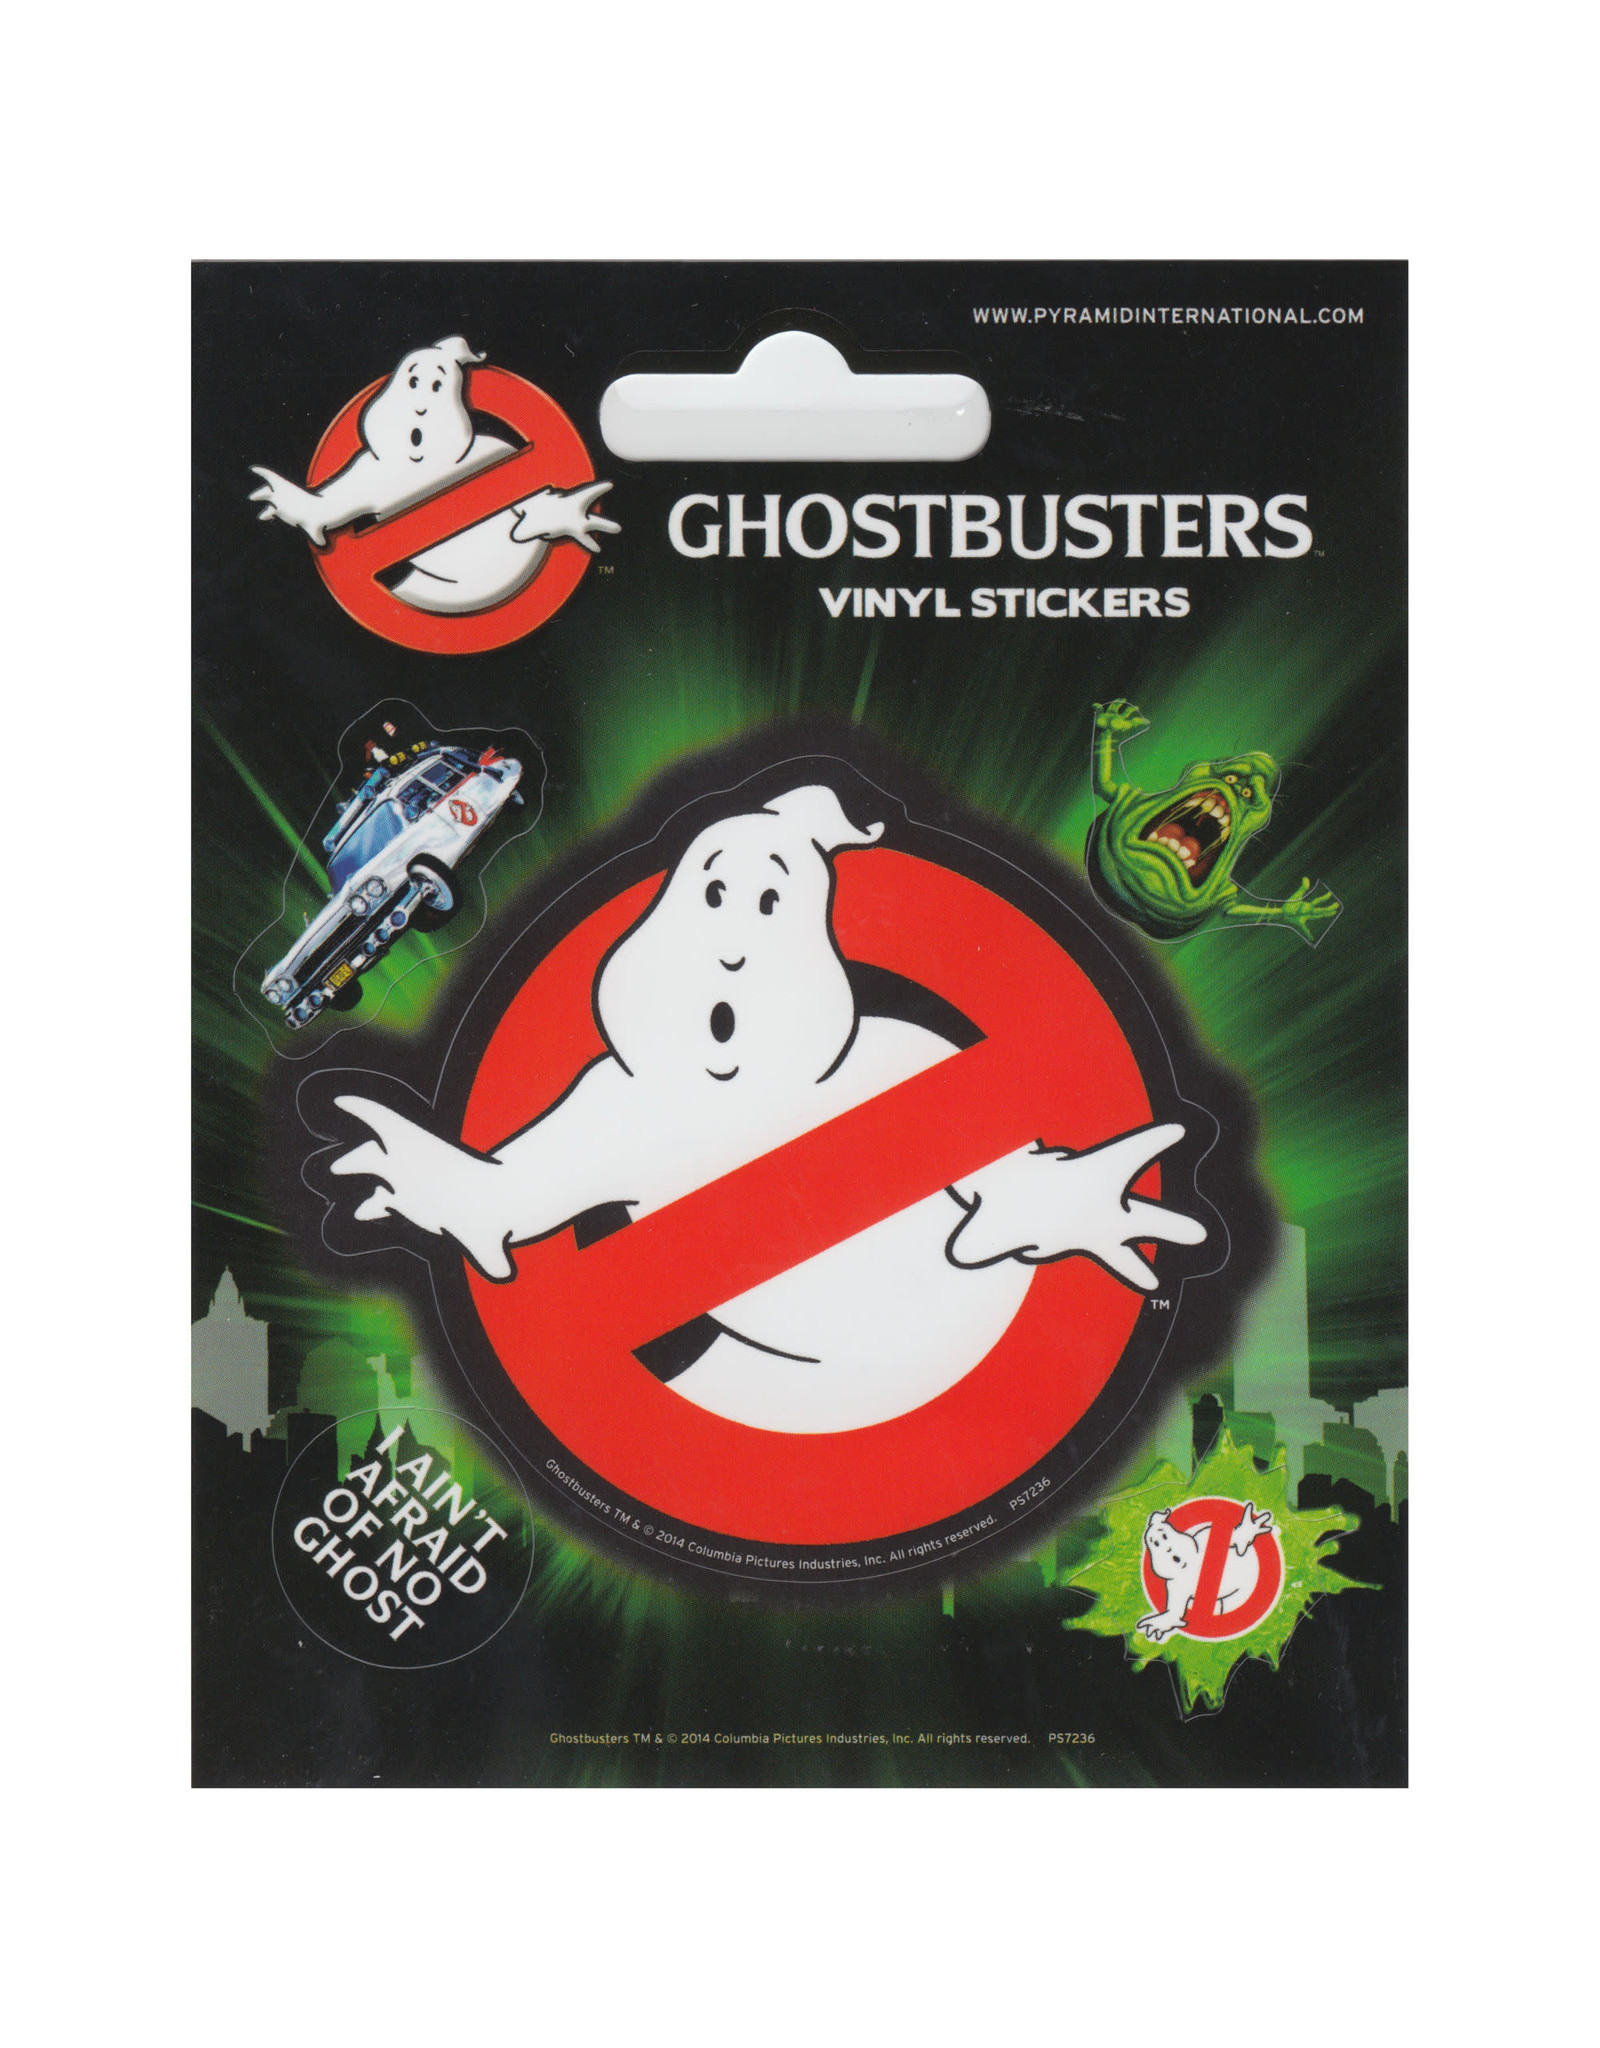 GHOSTBUSTER - Vinyl Stickers - Logo